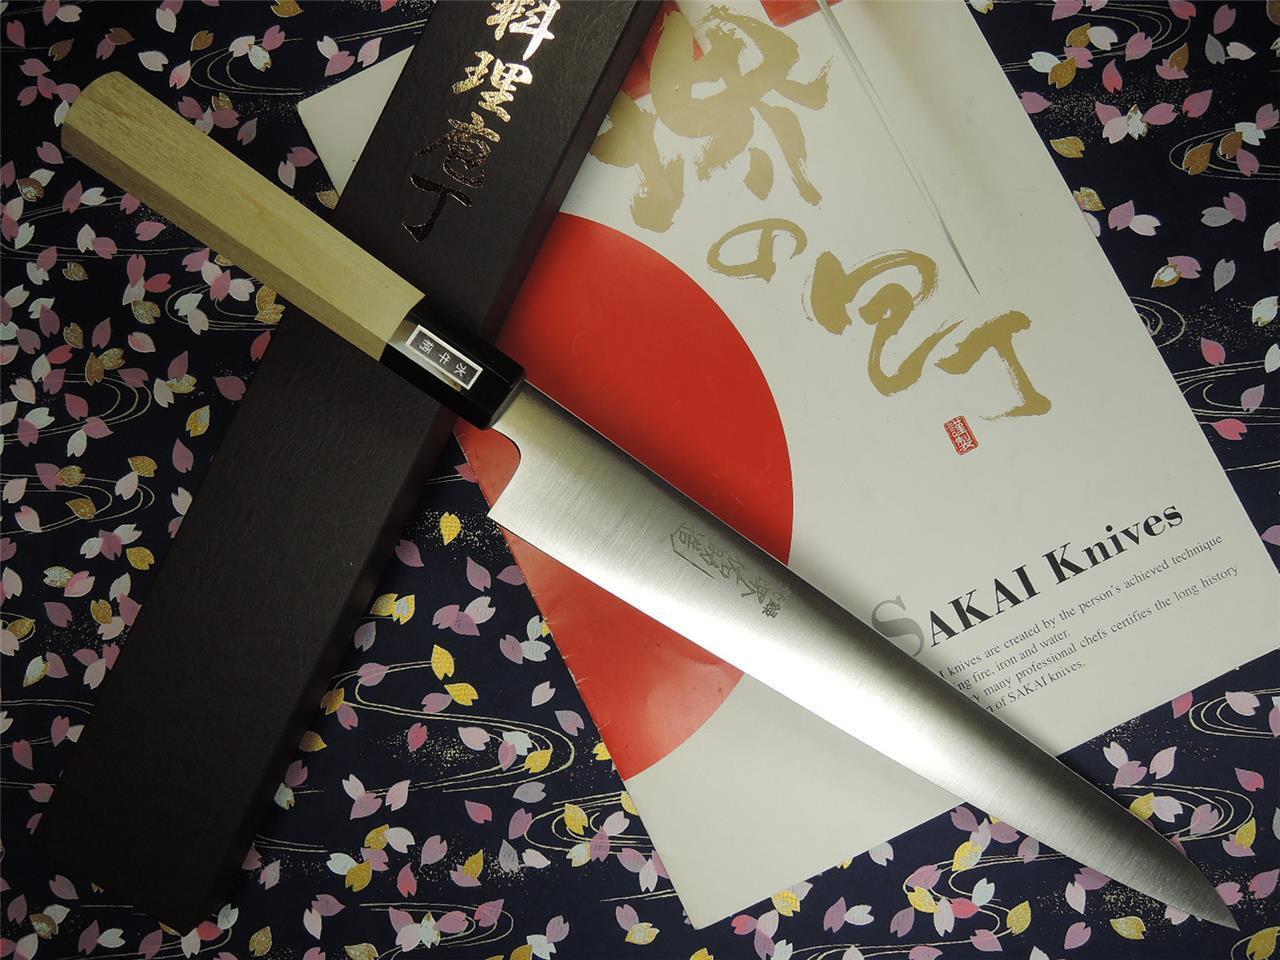 Japonais Sakai Yusuke Suédois Inoxydable WA-Sujihiki couteau 270 mm